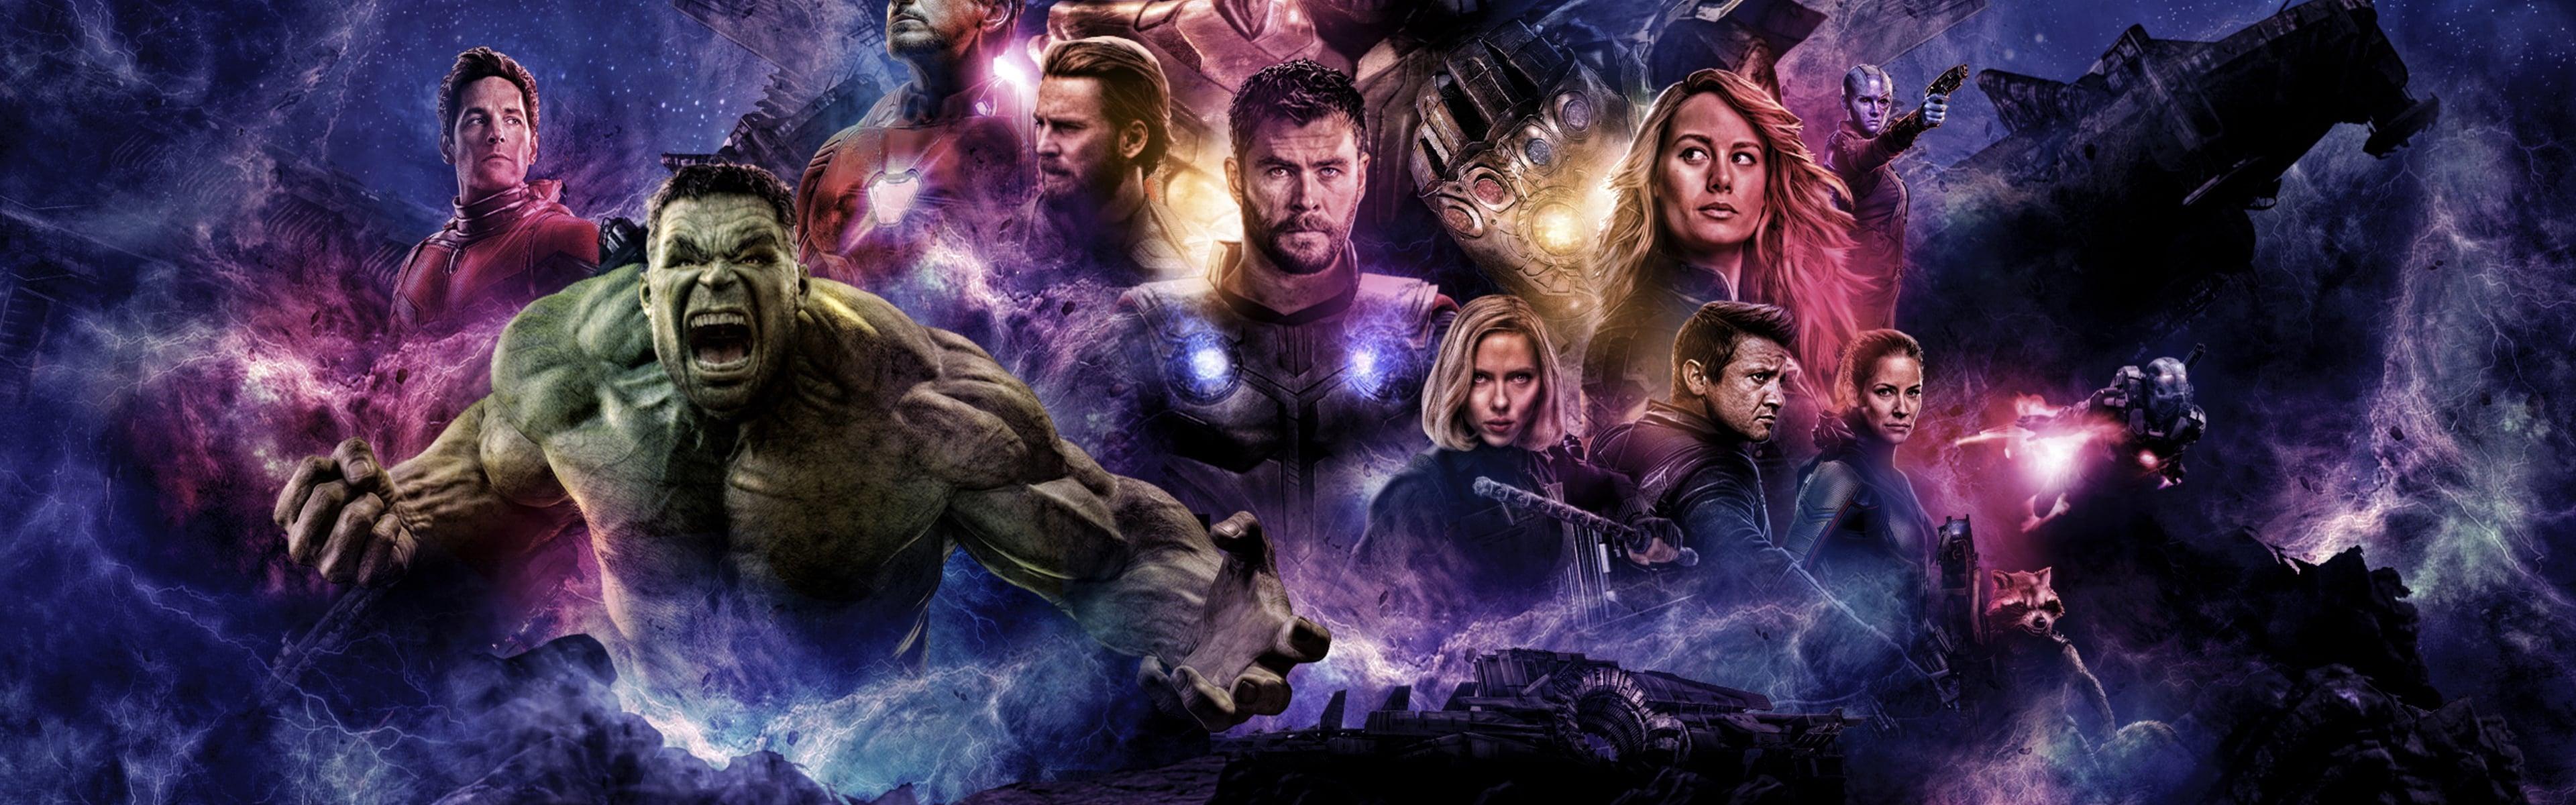 Wallpaper Avengers Endgame Dc Comics Movie 2019 3840x2160 Uhd 4k